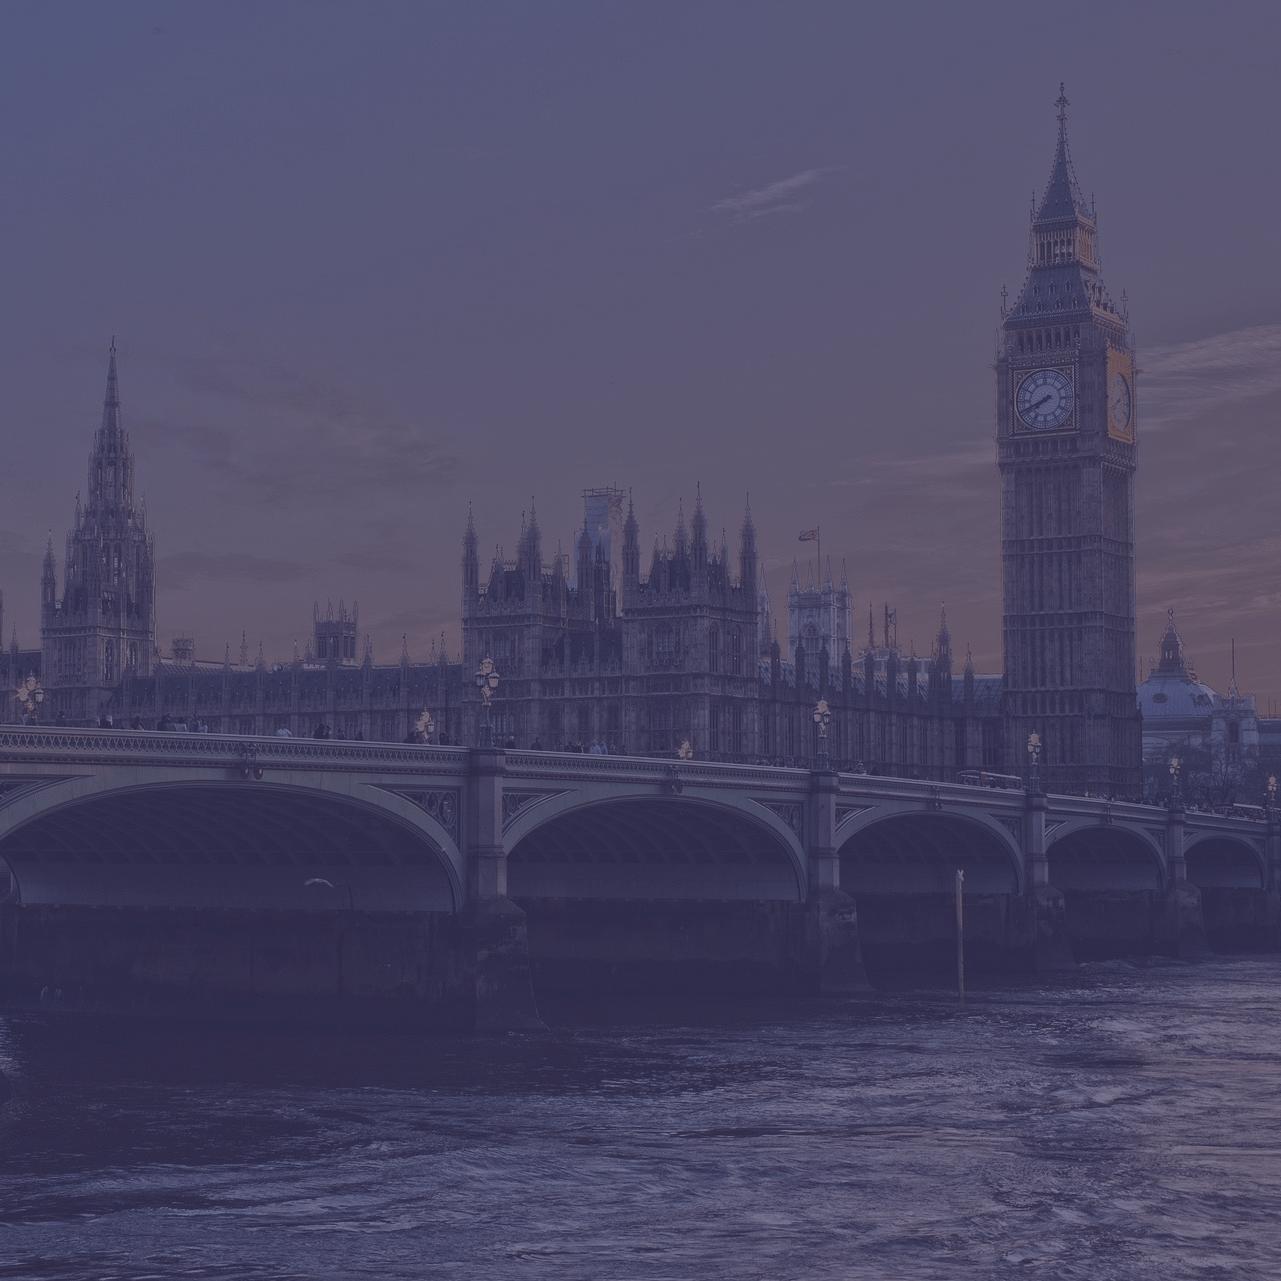 london-530055_1920-e1586334780825